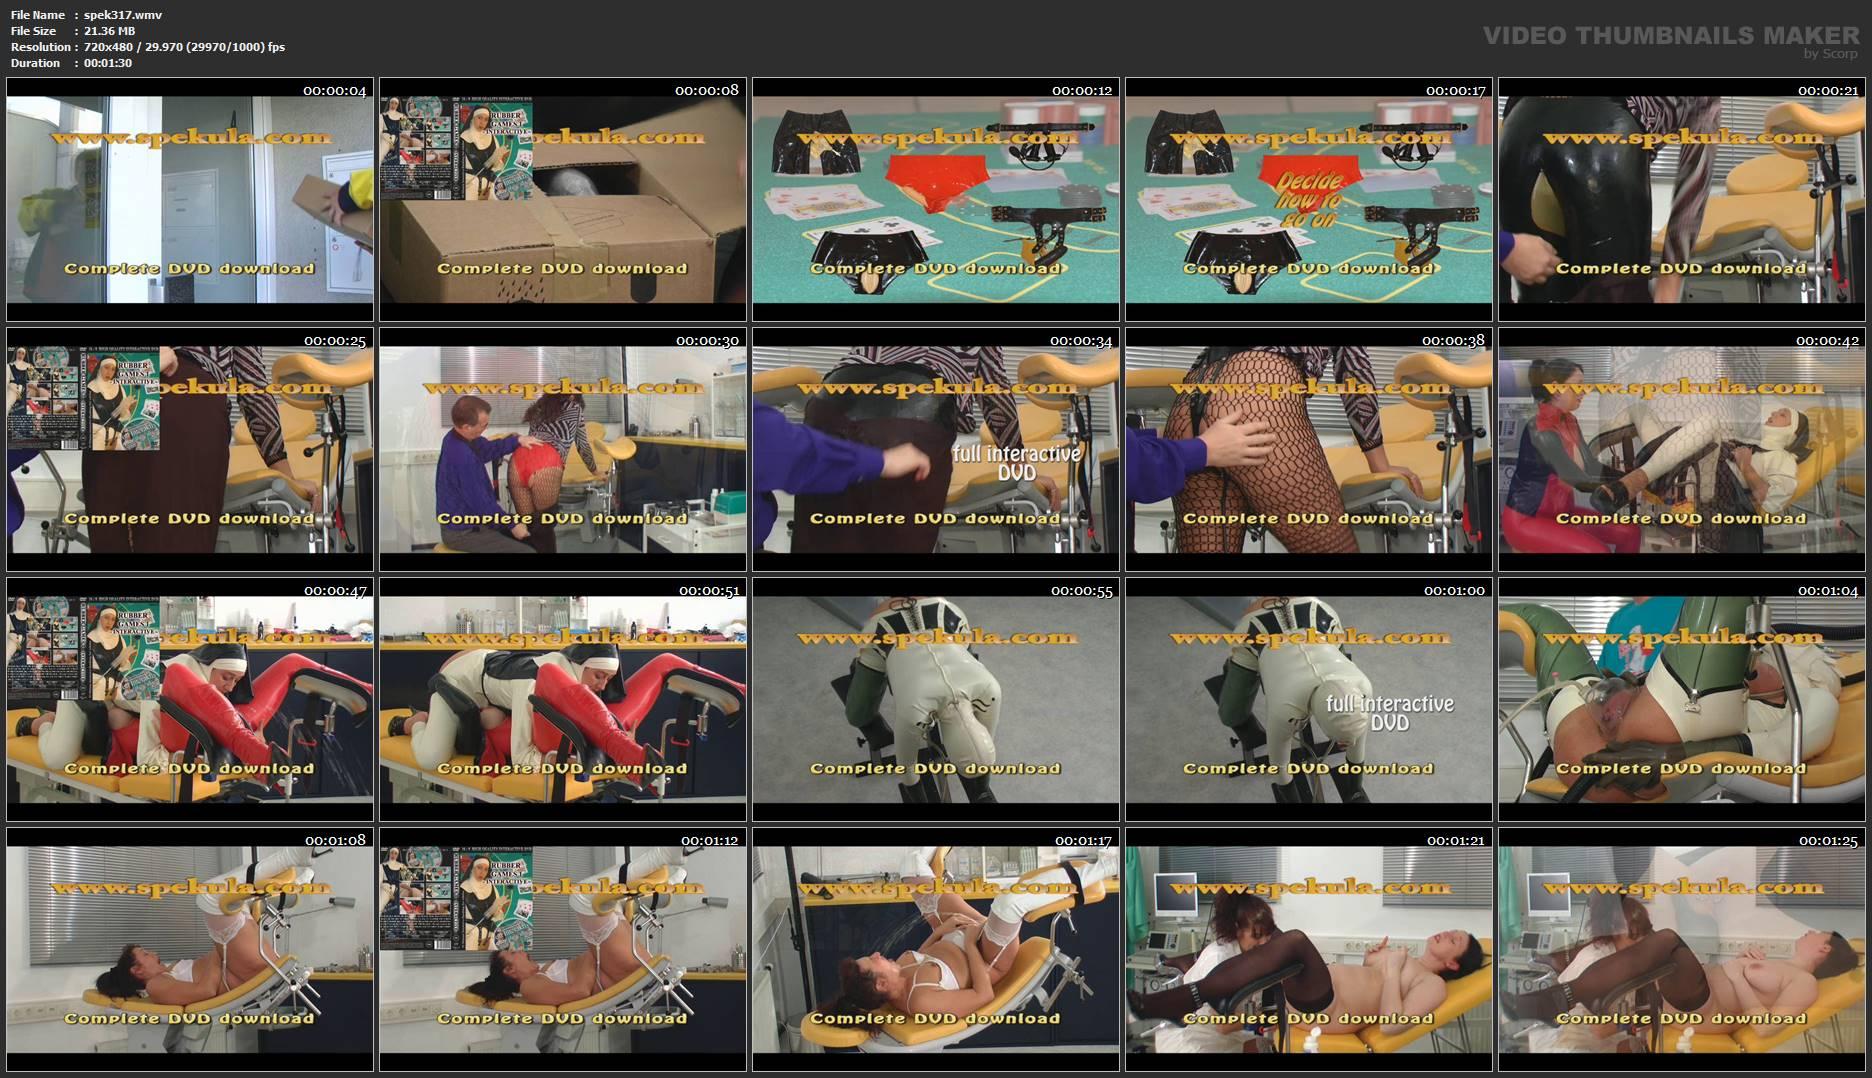 [SPEKULA] DVD interactive download [SD][480p][WMV]